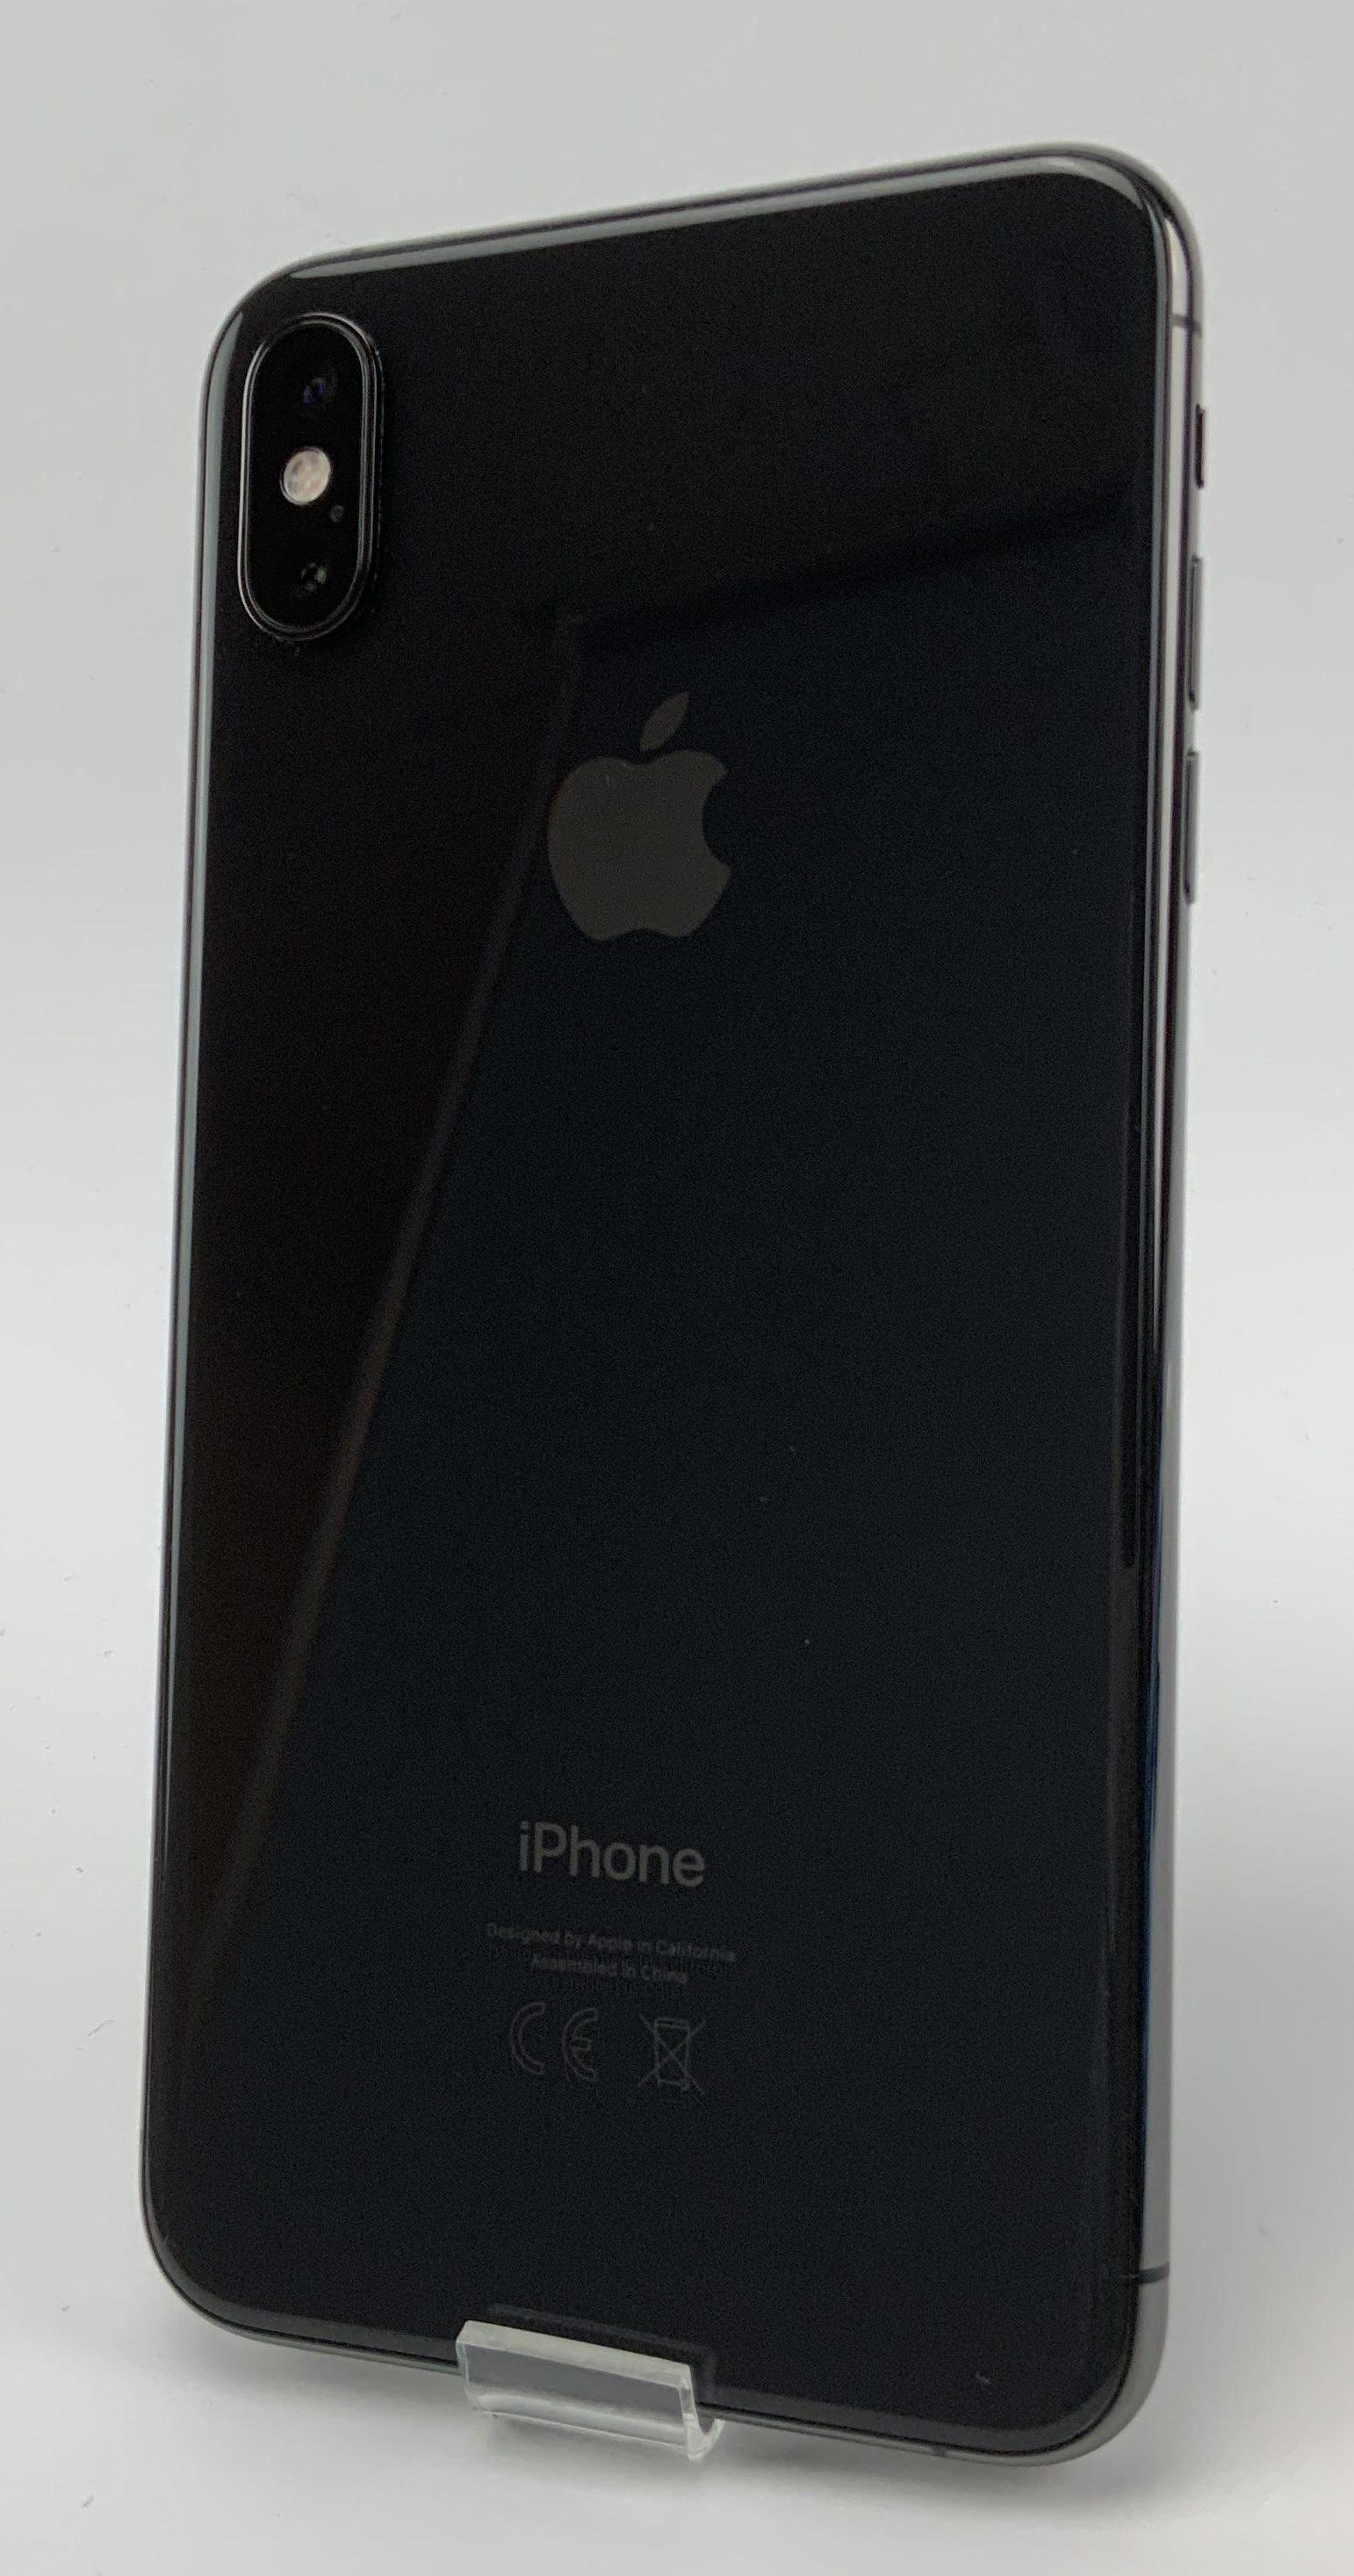 iPhone XS Max 256GB, 256GB, Space Gray, immagine 2